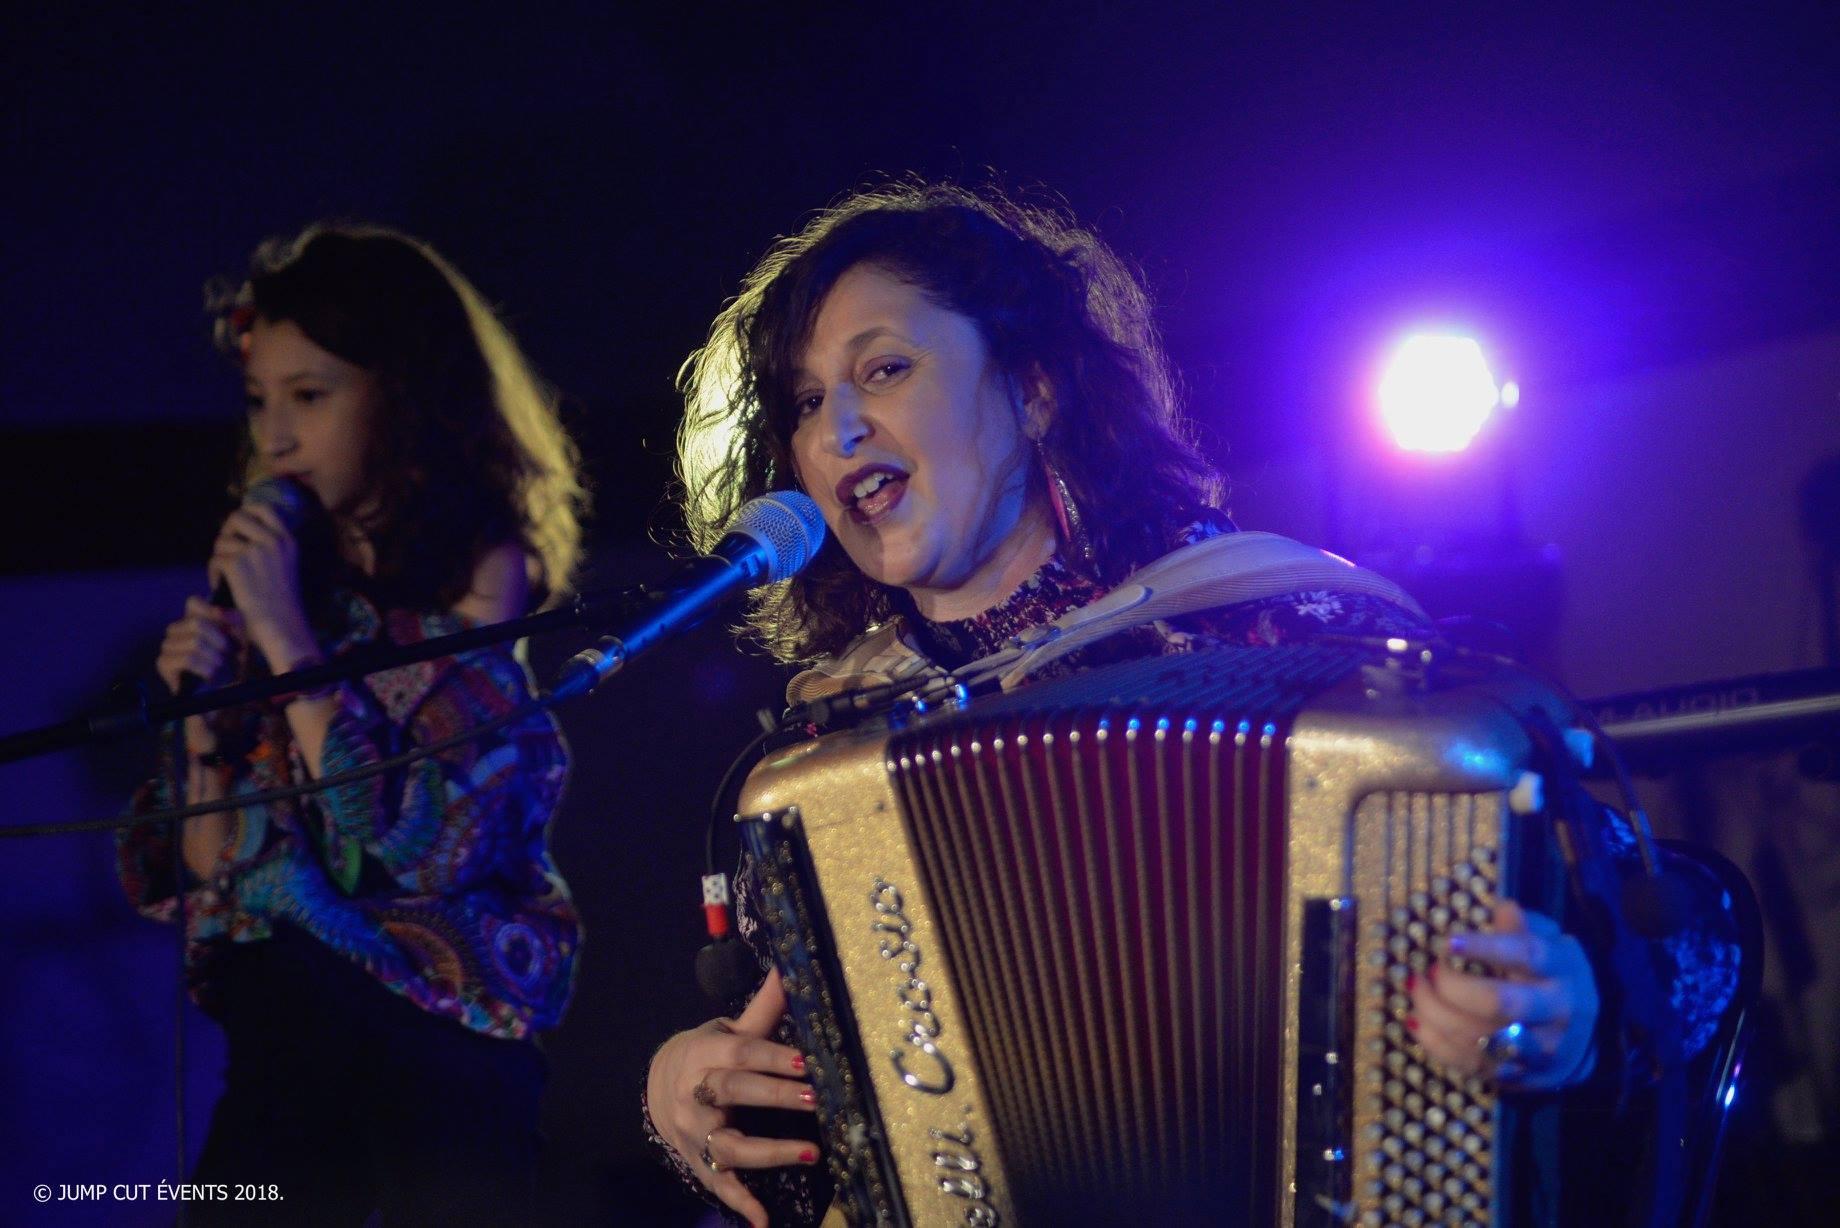 Myriam Chouit